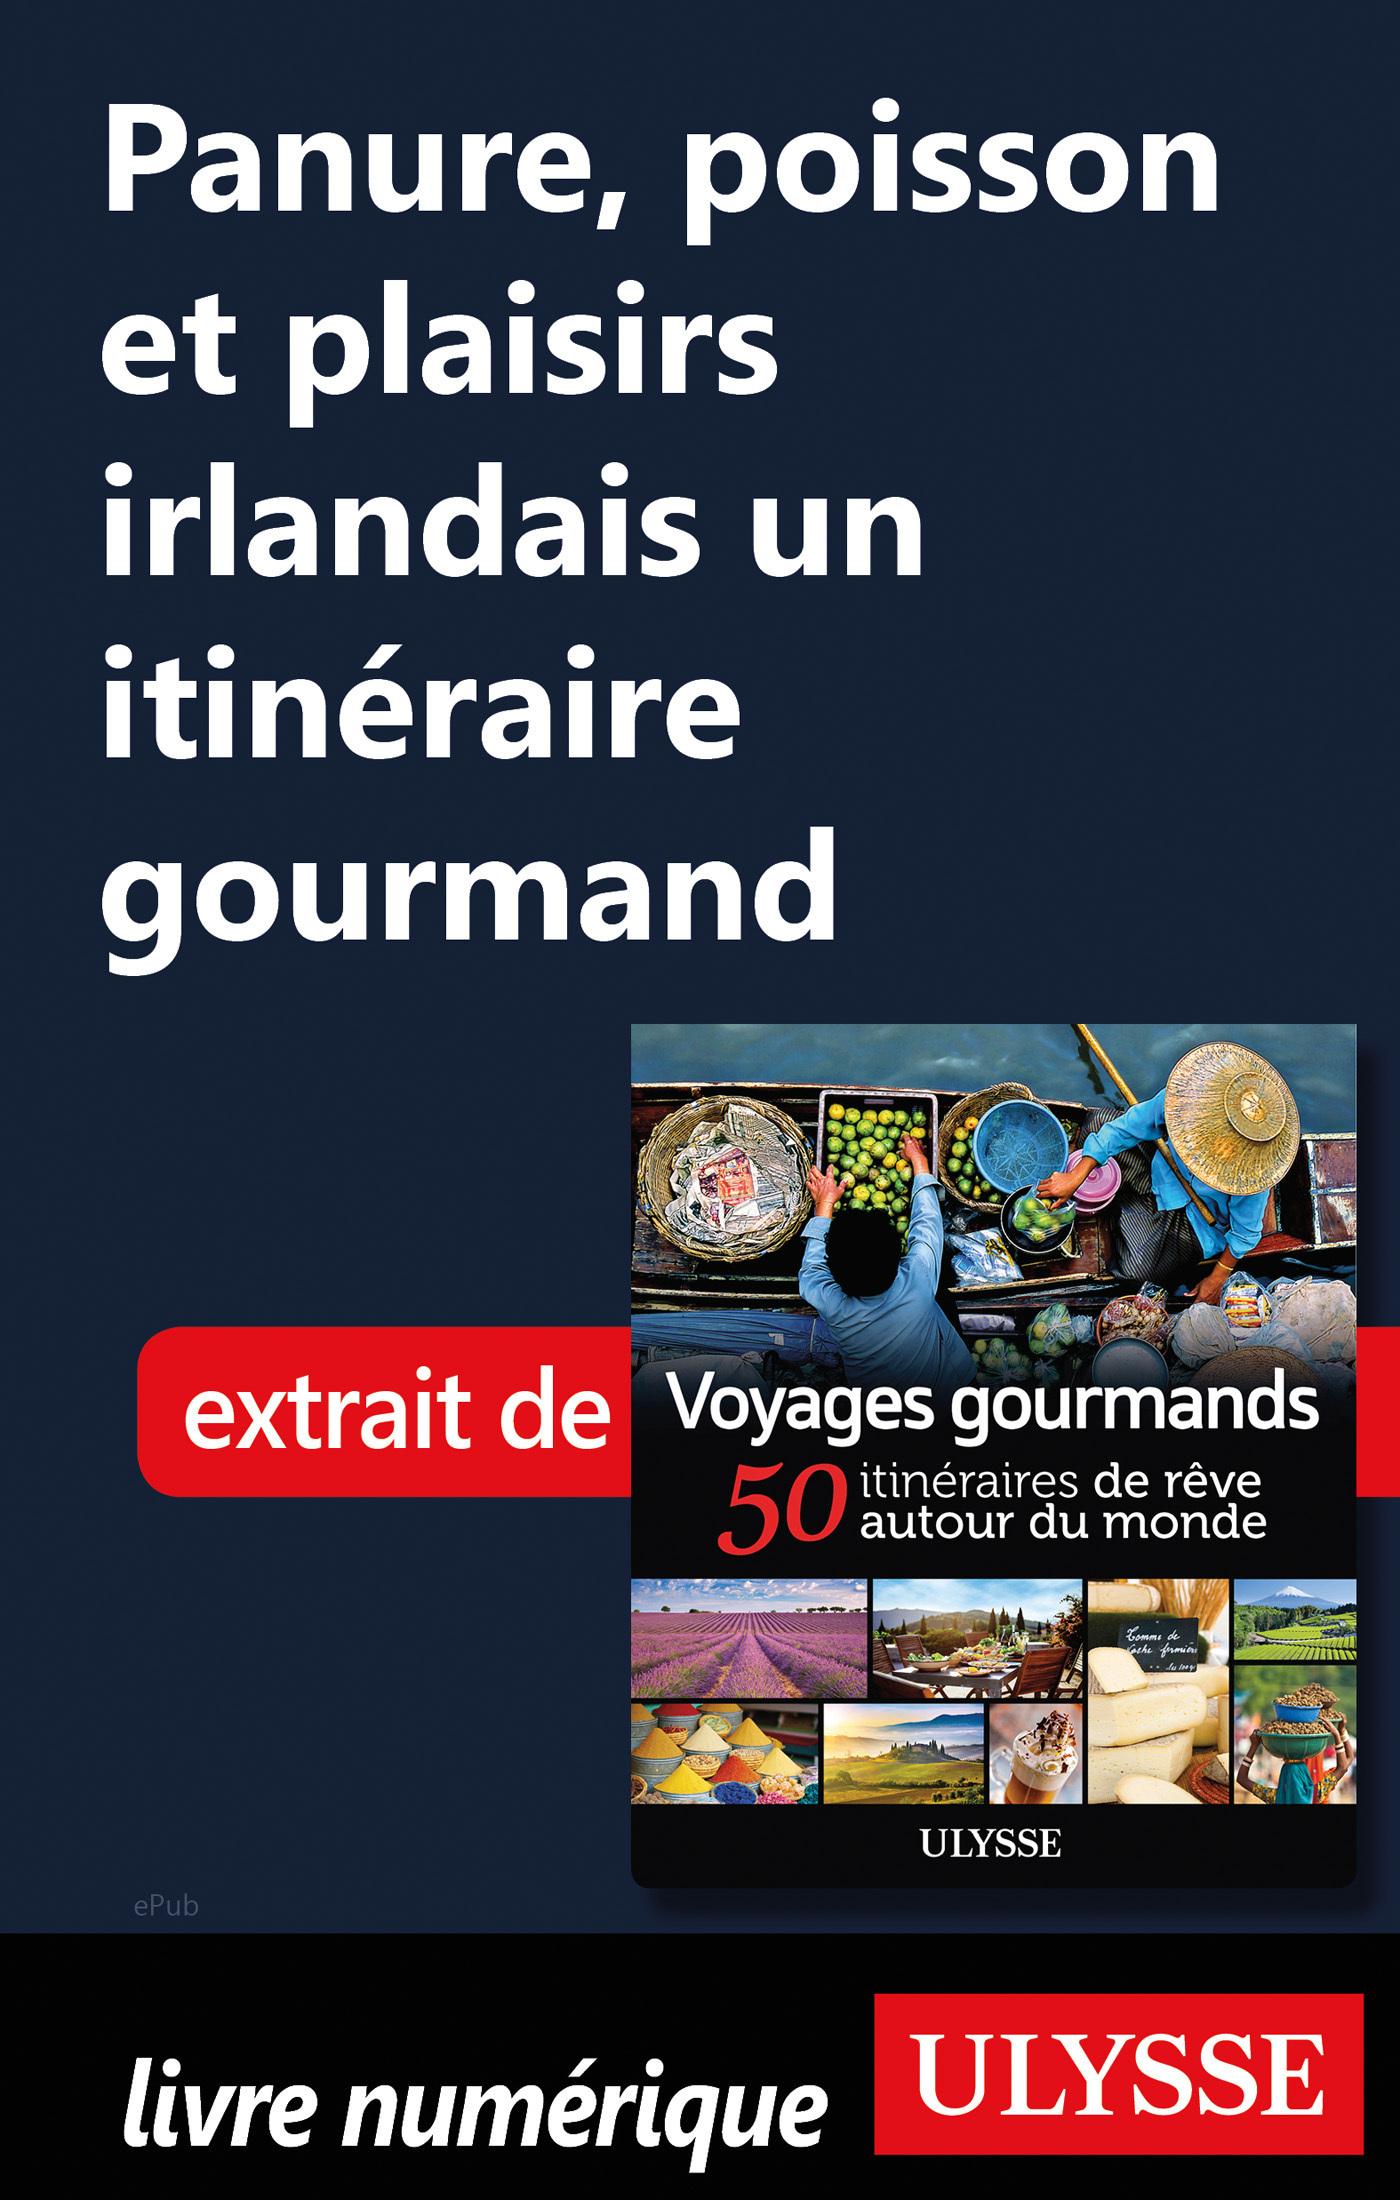 Panure, poisson et plaisirs irlandais - Un itinéraire gourmand